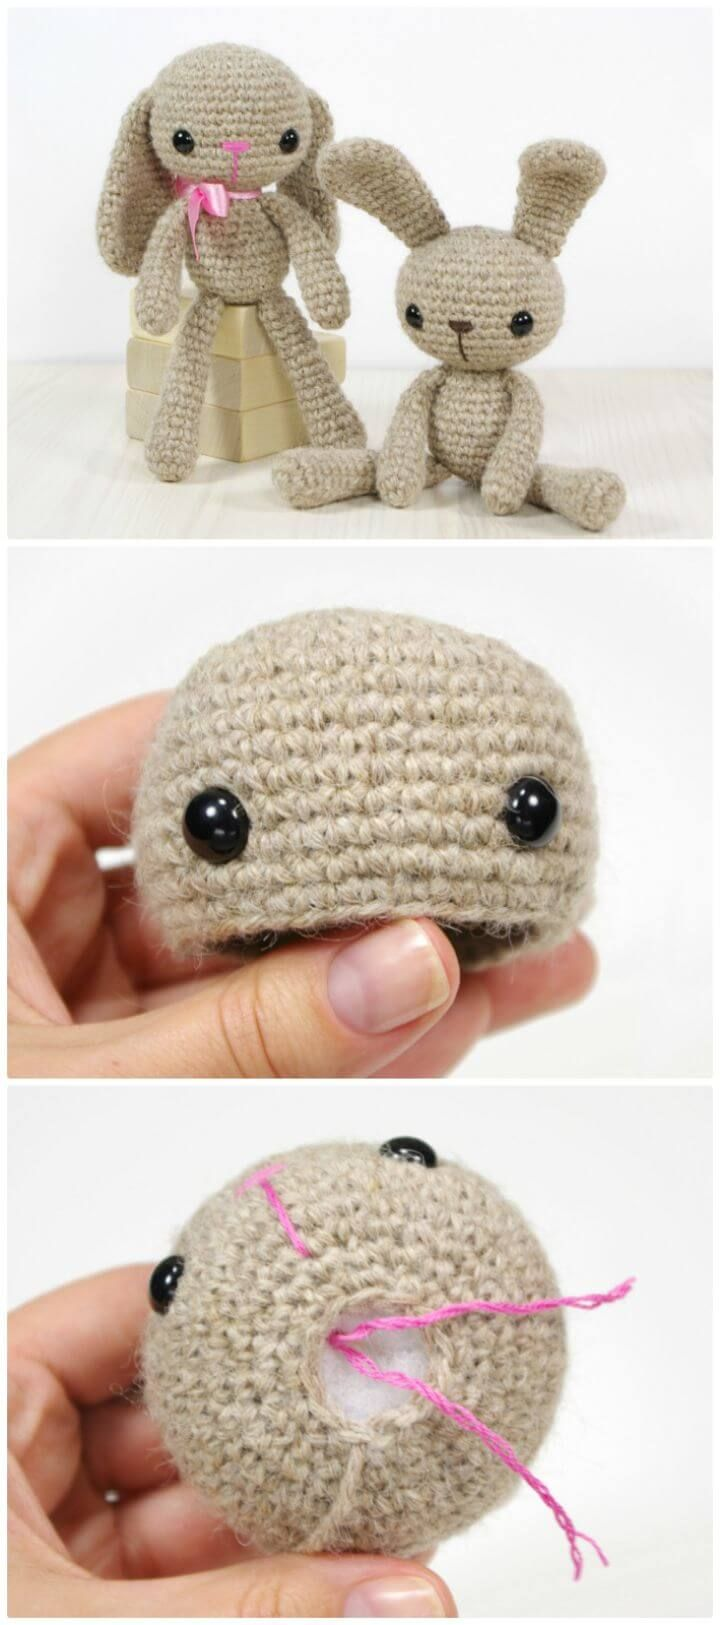 63 Free Crochet Bunny Amigurumi Patterns | amigurumi | Pinterest ...